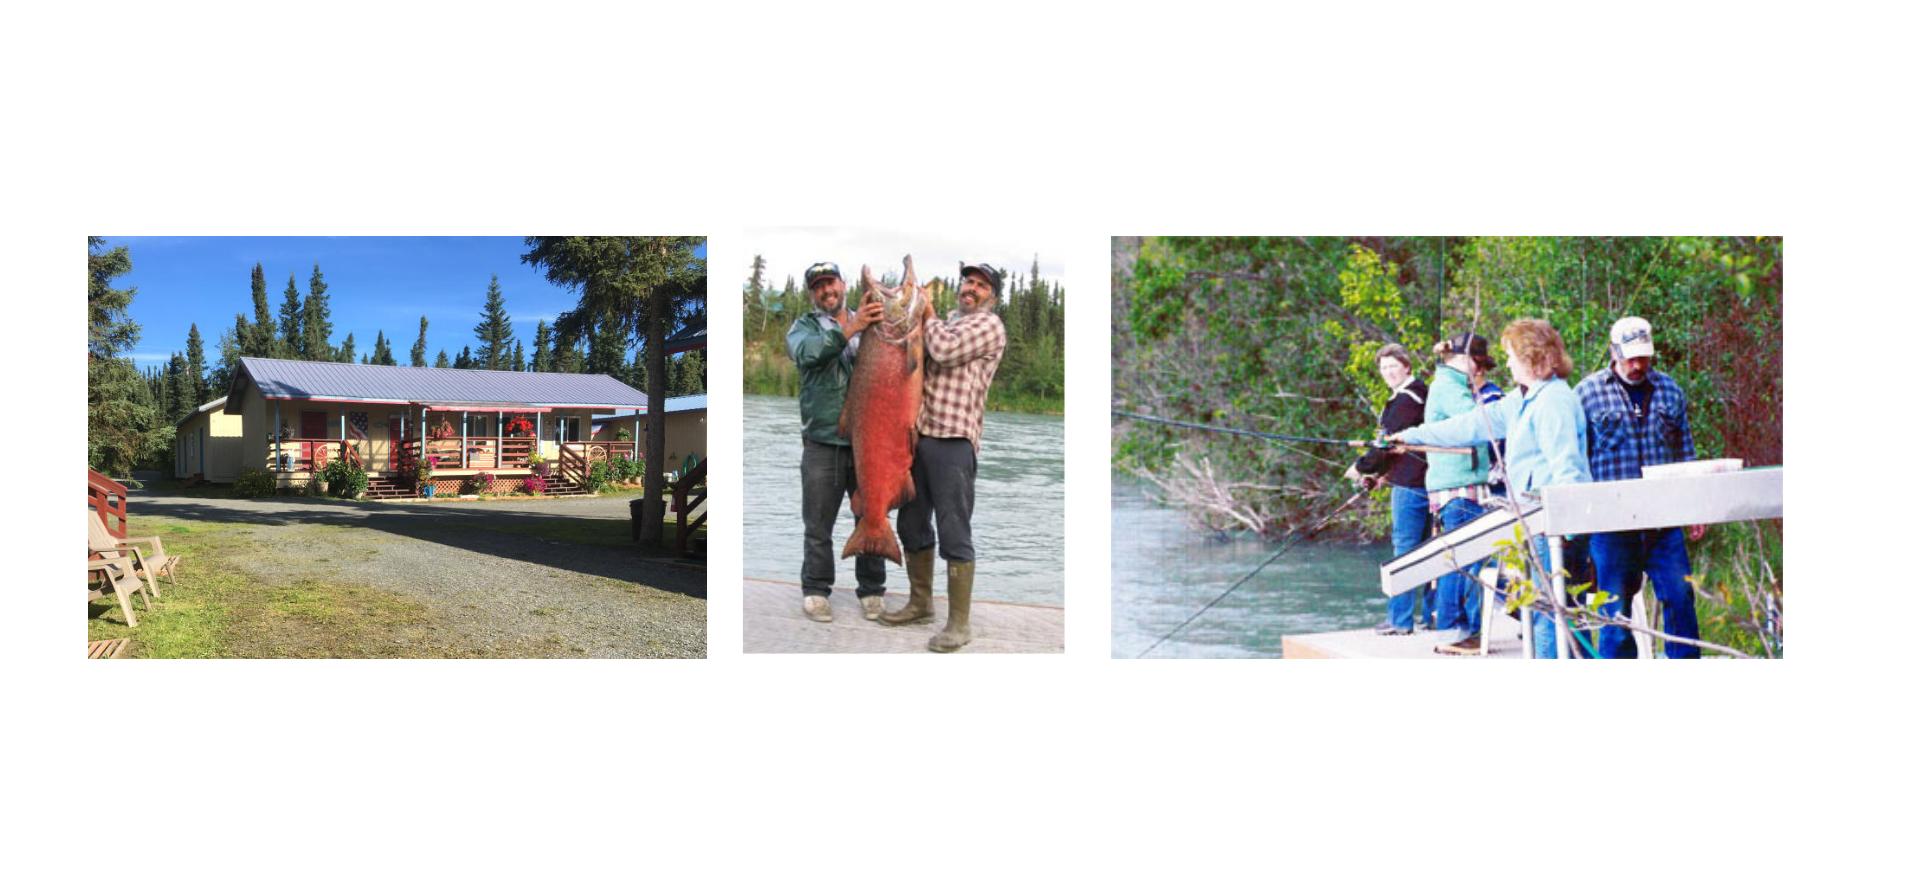 Catch 'Em River Front Lodge